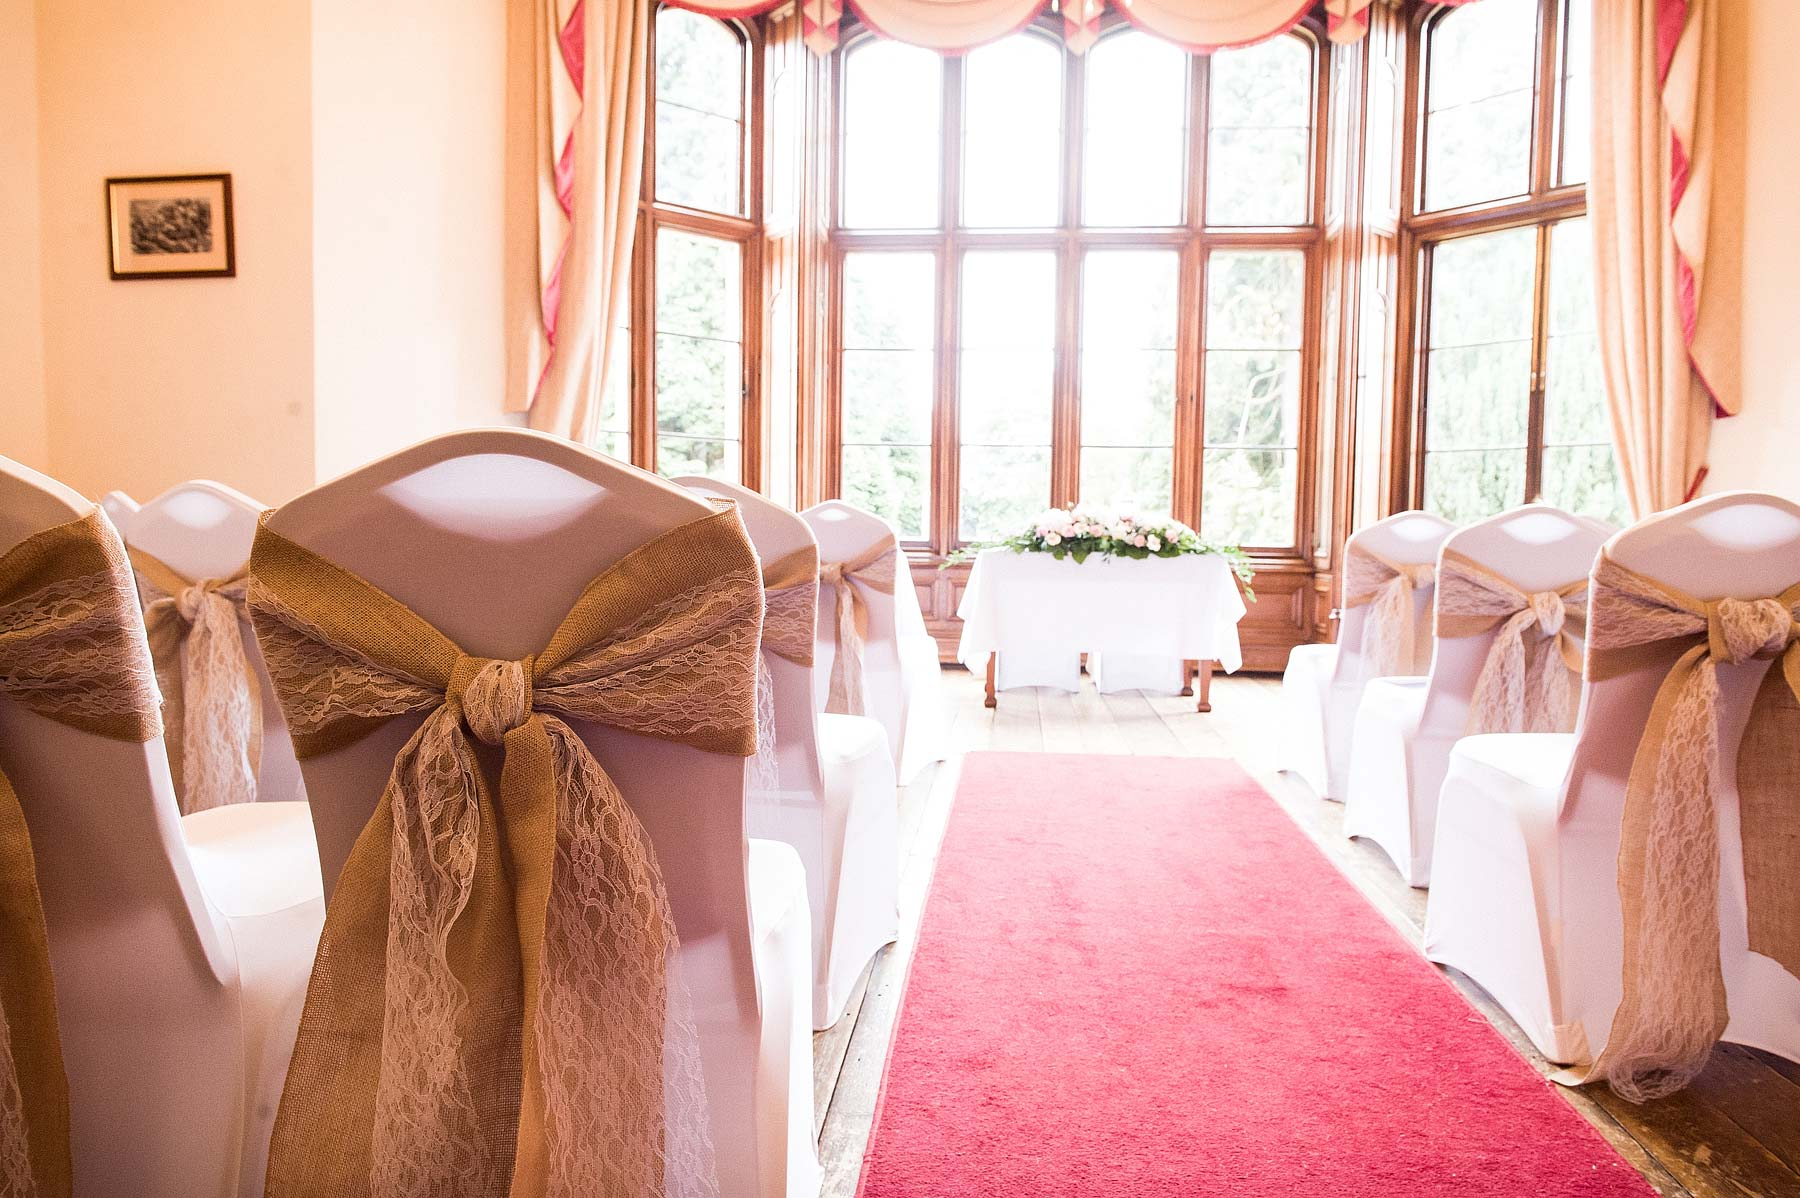 hawkesyard-estate-wedding-photographers-rugeley-004